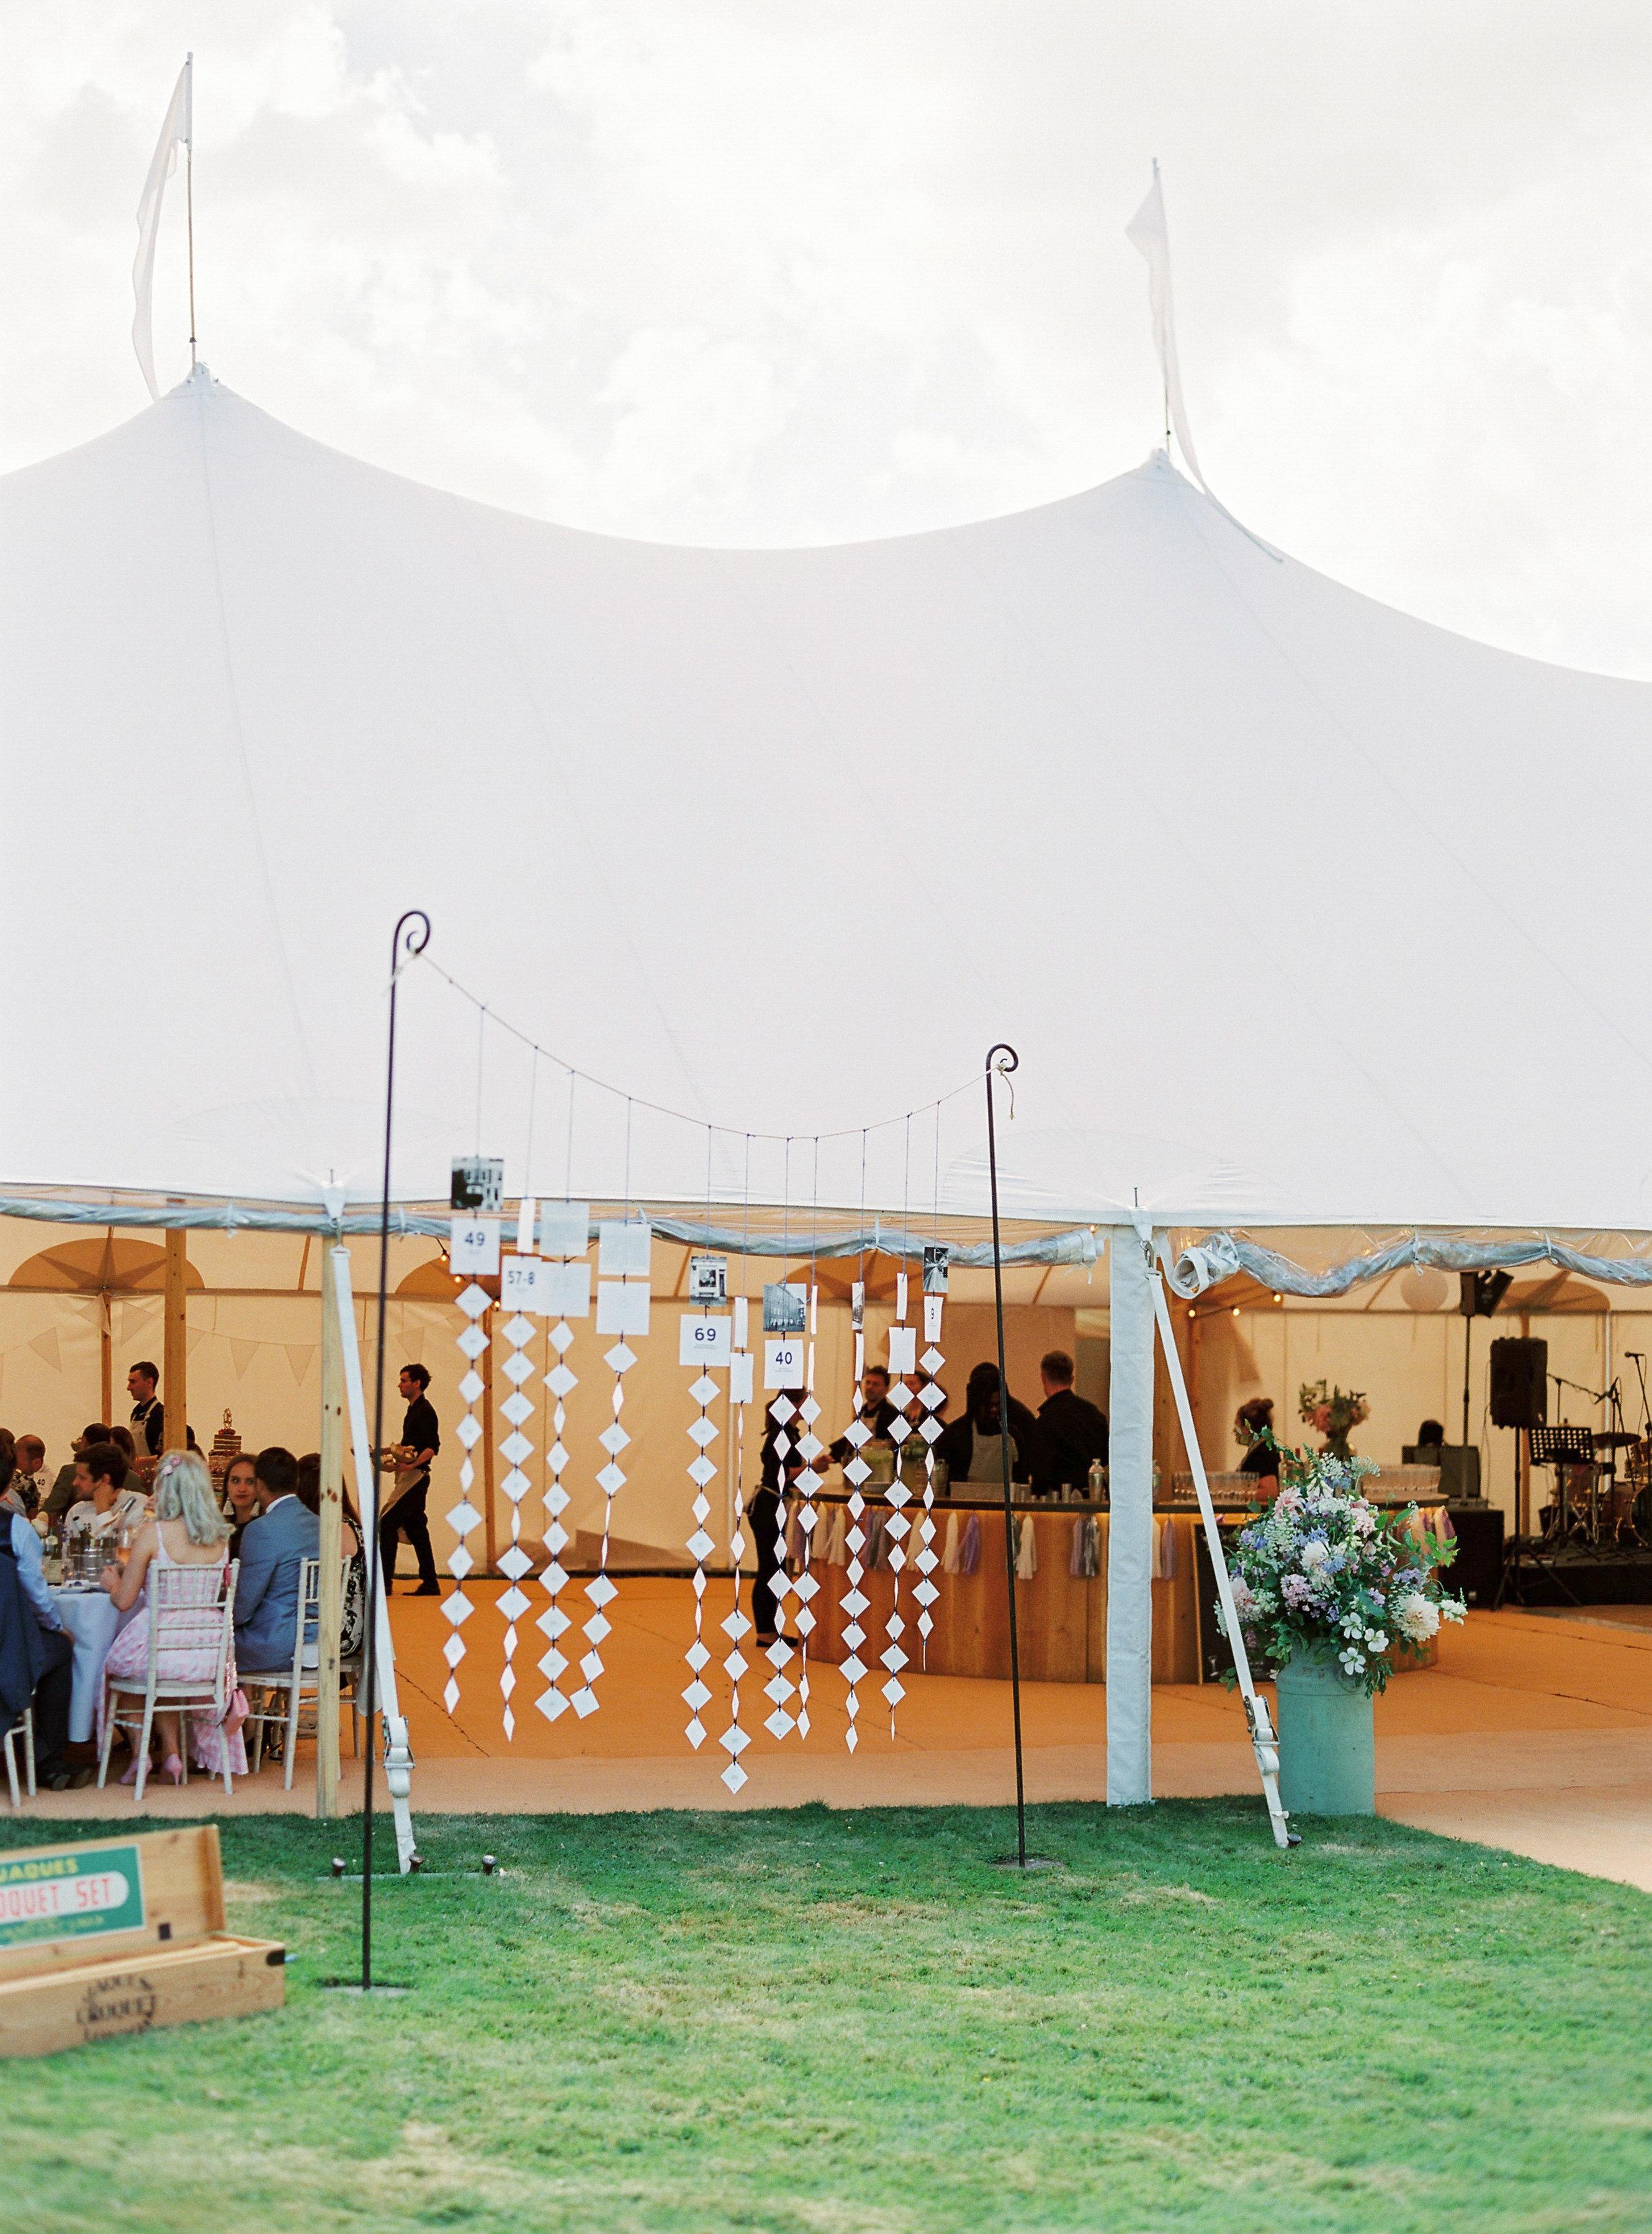 Georgie & Ben's PapaKåta Sperry Tent wedding at Newington House captured by Lucy Davenport: Table Plan Decoration Ideas